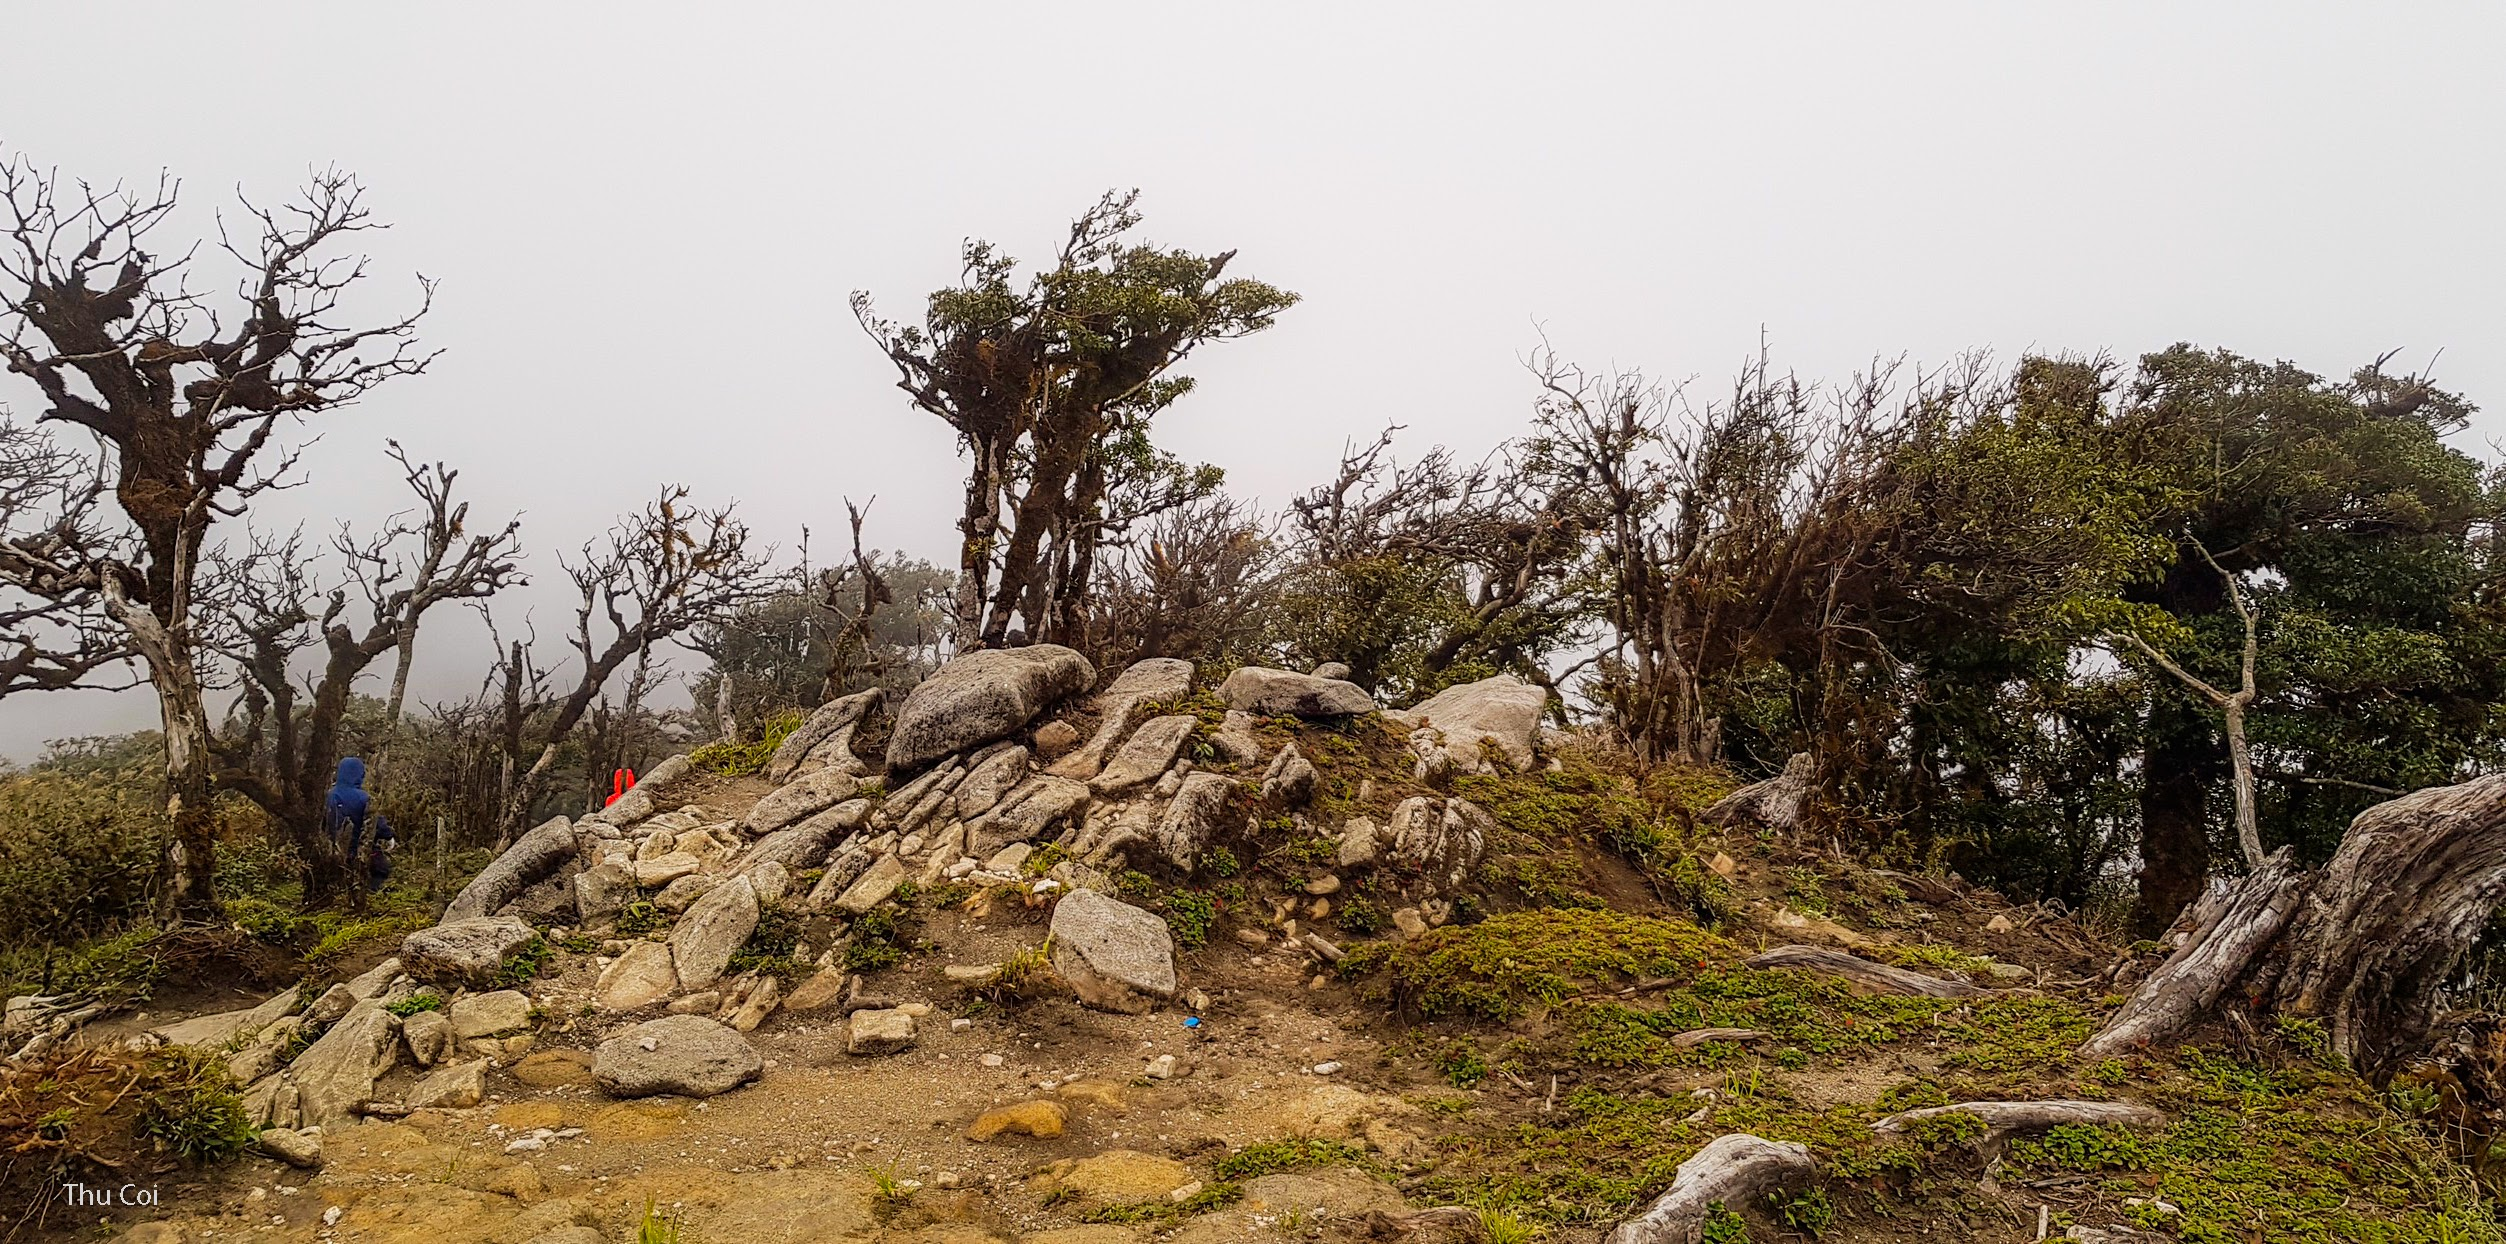 Trekking Tour Kỳ Quan San 3046 m (Bạch Mộc Lương Tử)